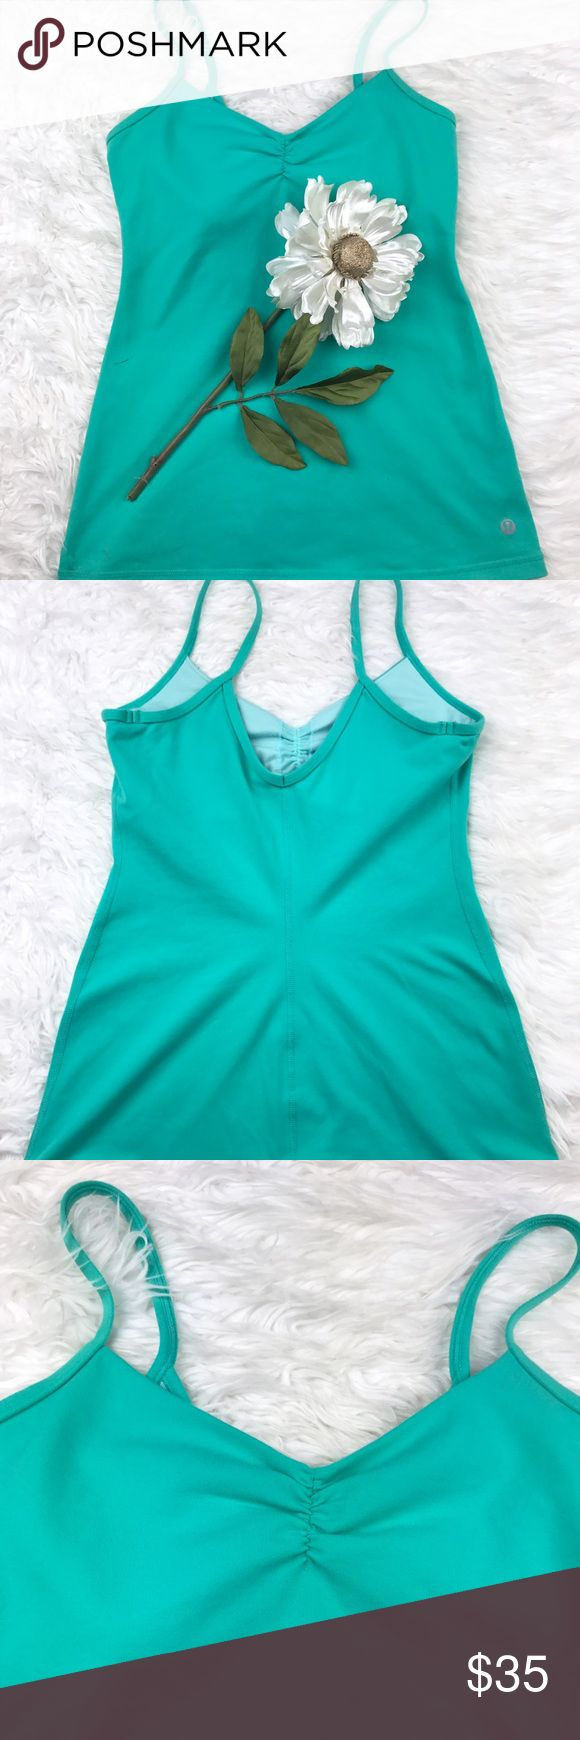 💕SALE💕Lululemon Turquoise Green Tank Top Fantastic 💕Lululemon Turquoise Green Tank Top lululemon athletica Tops Tank Tops